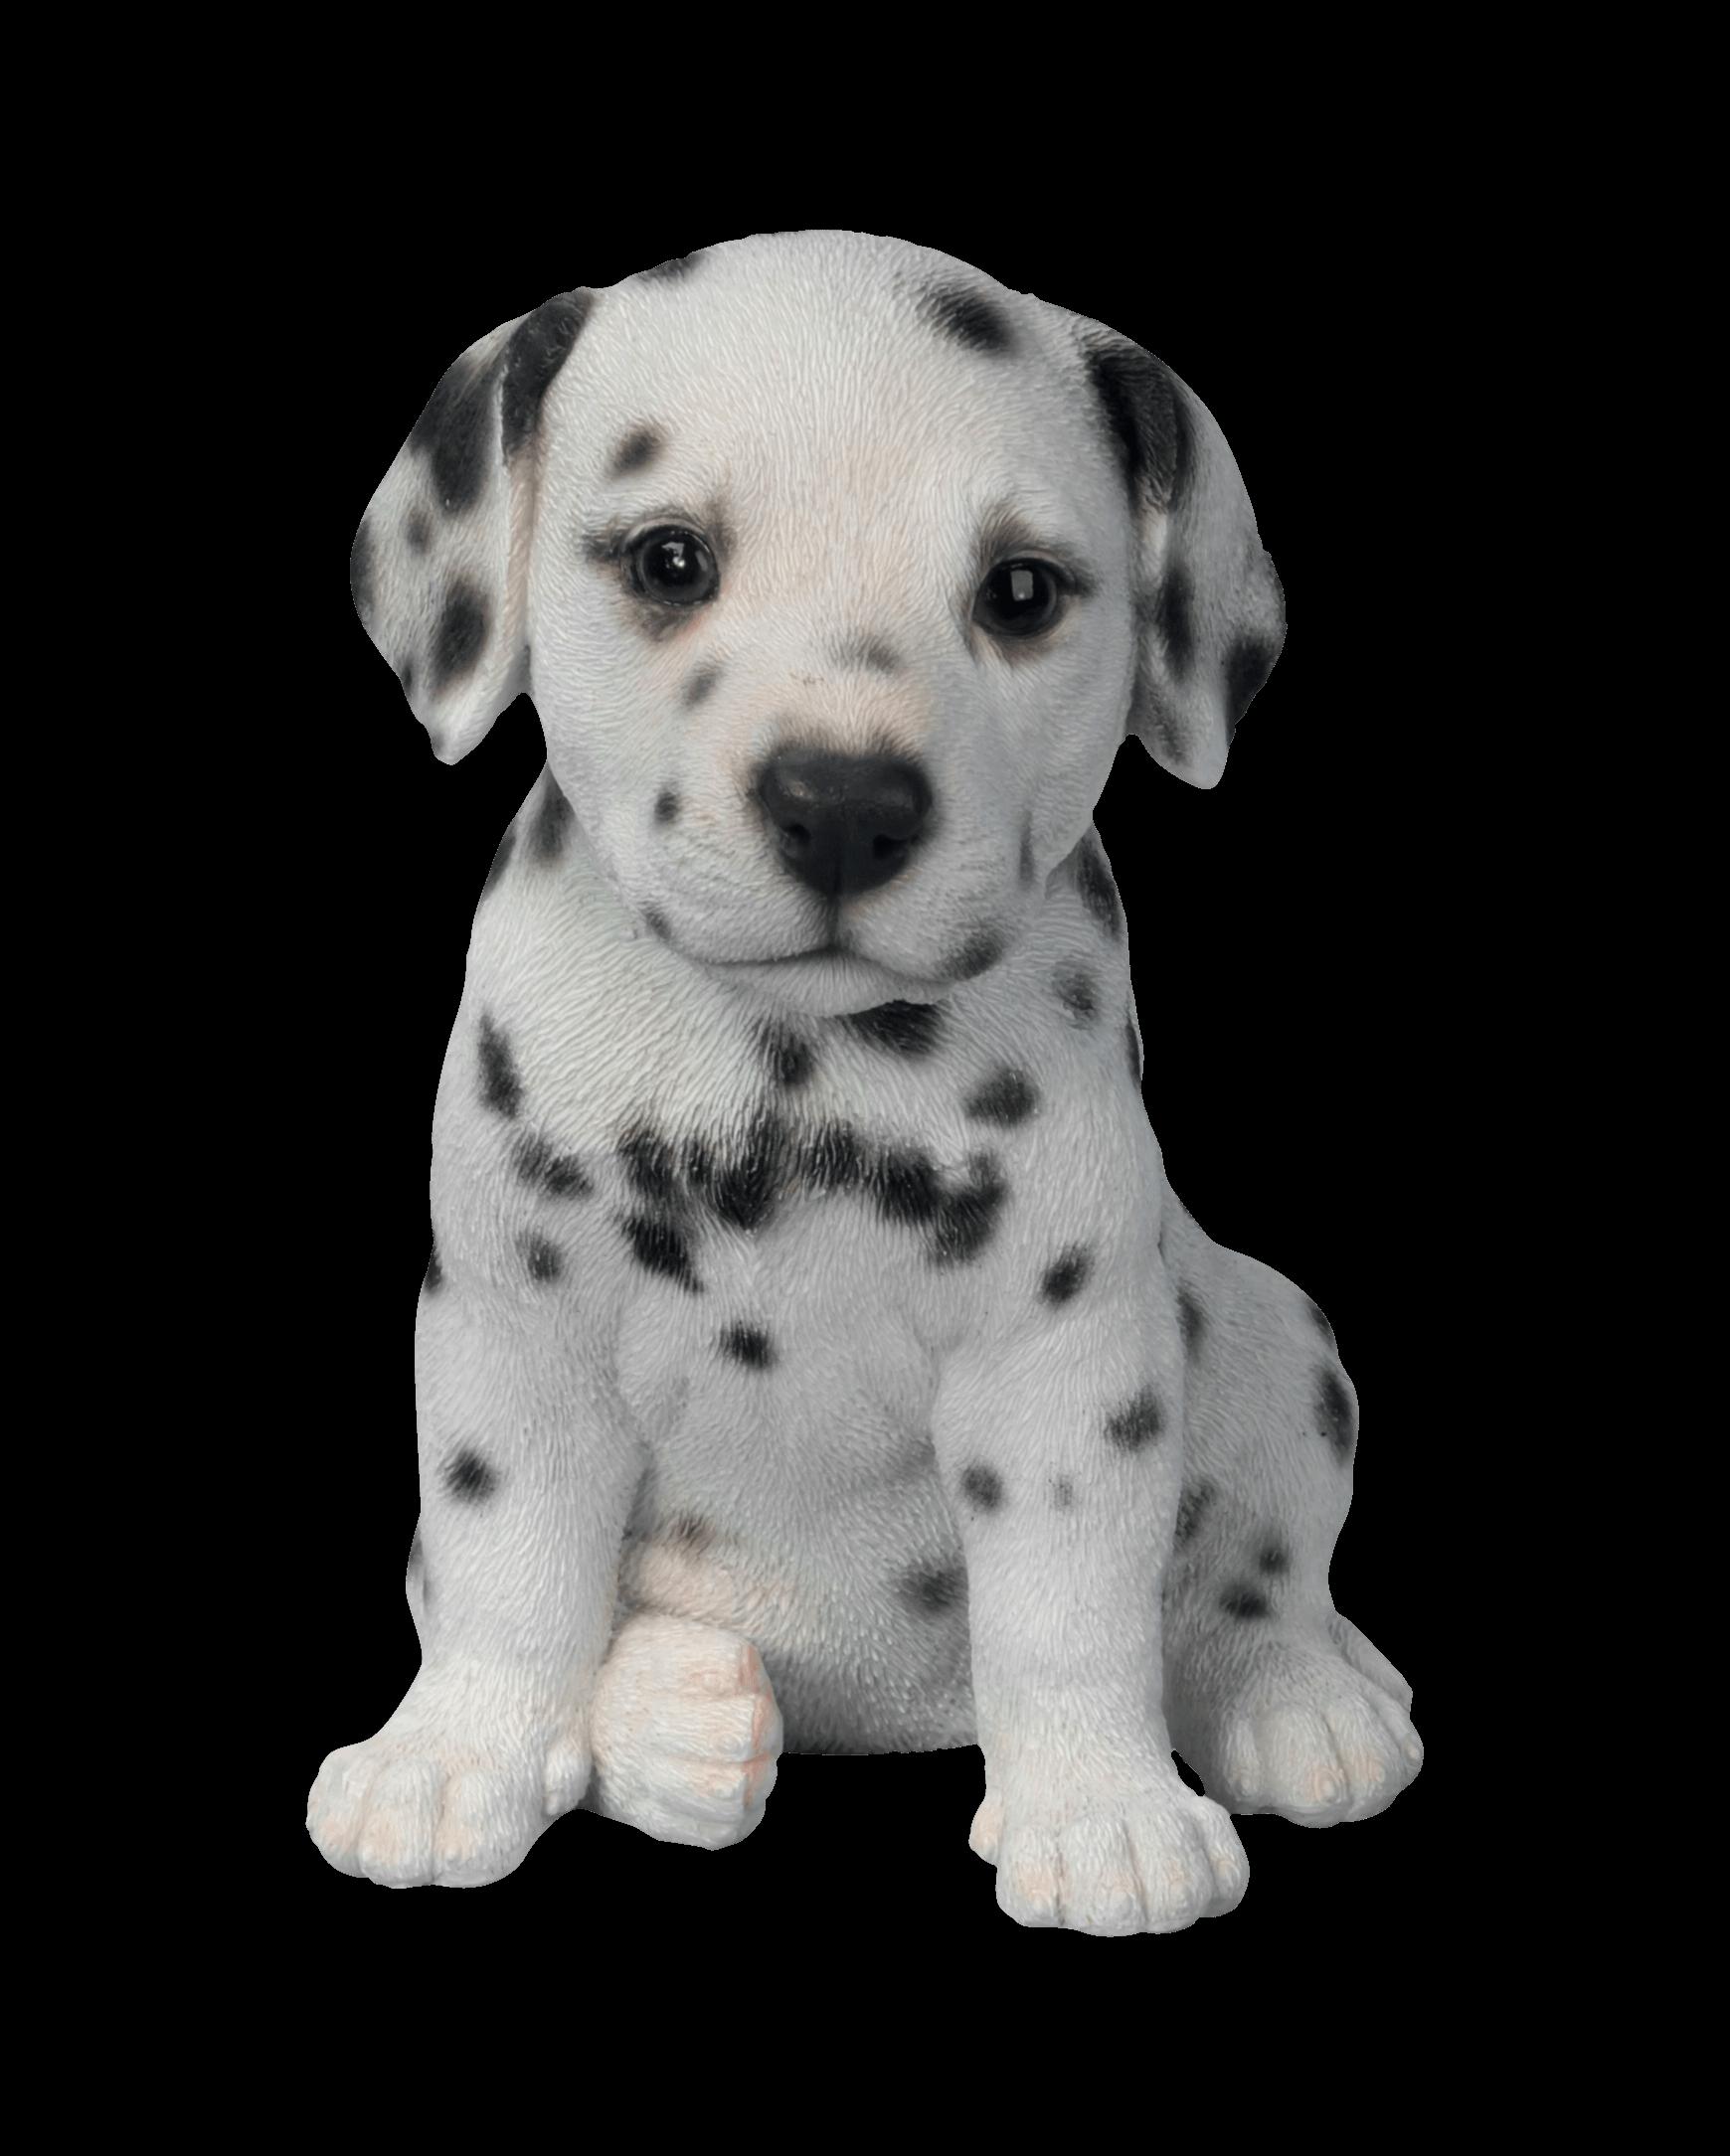 Clipart puppy puppy face. Dalmatian transparent png stickpng